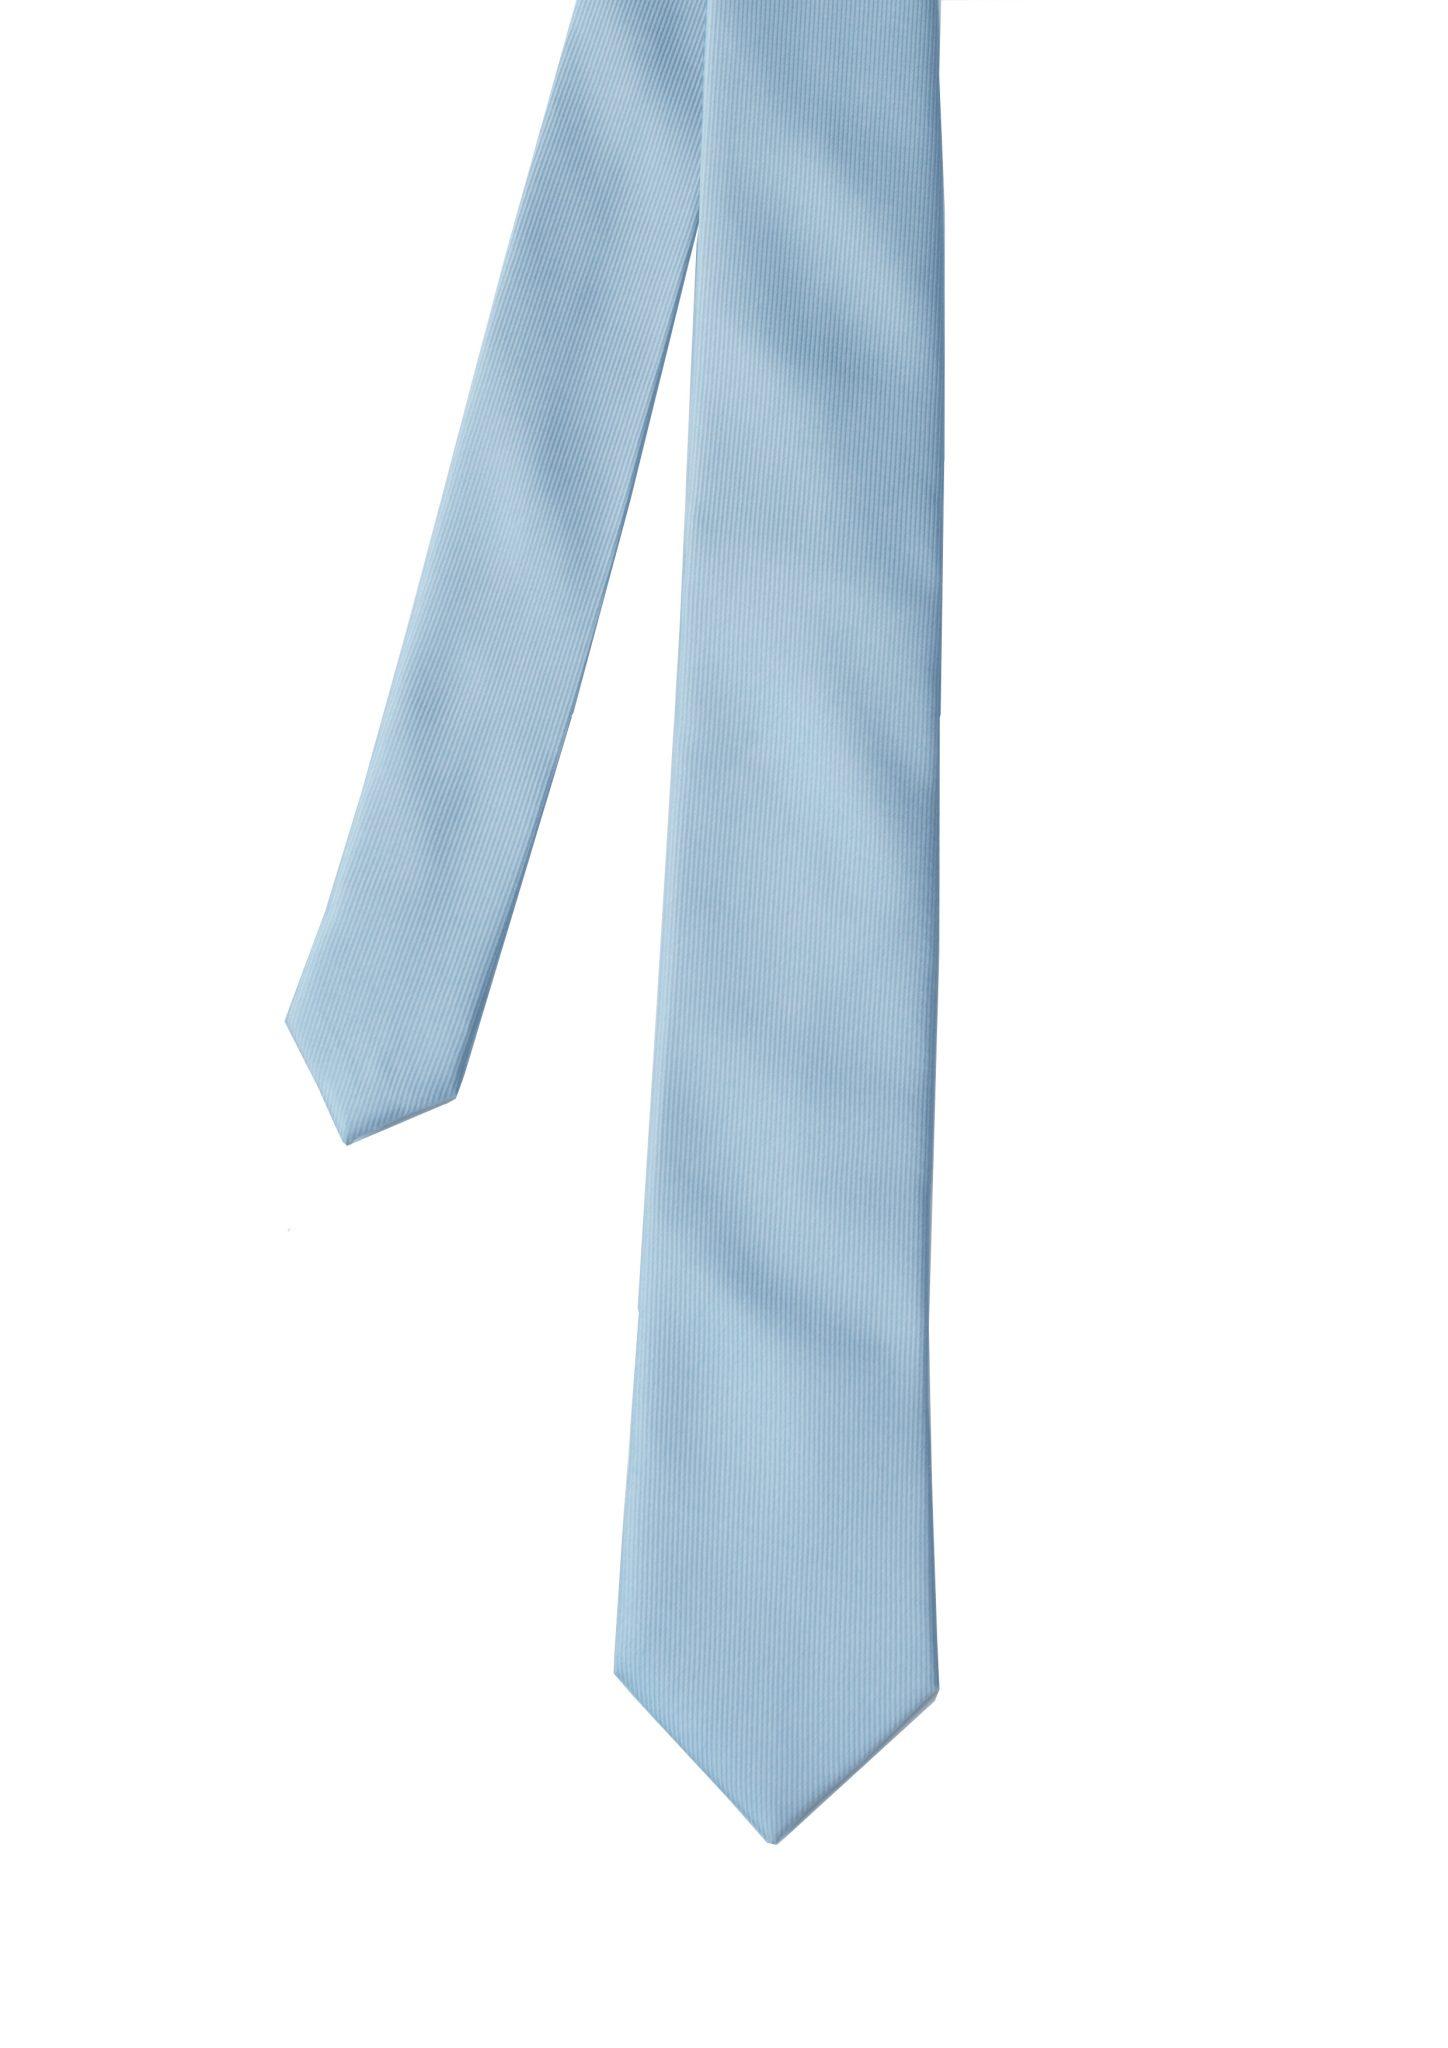 7a7bb3bf2545 Gianni Feraud Plain Dusty Blue Satin Tie – Gianni Feraud